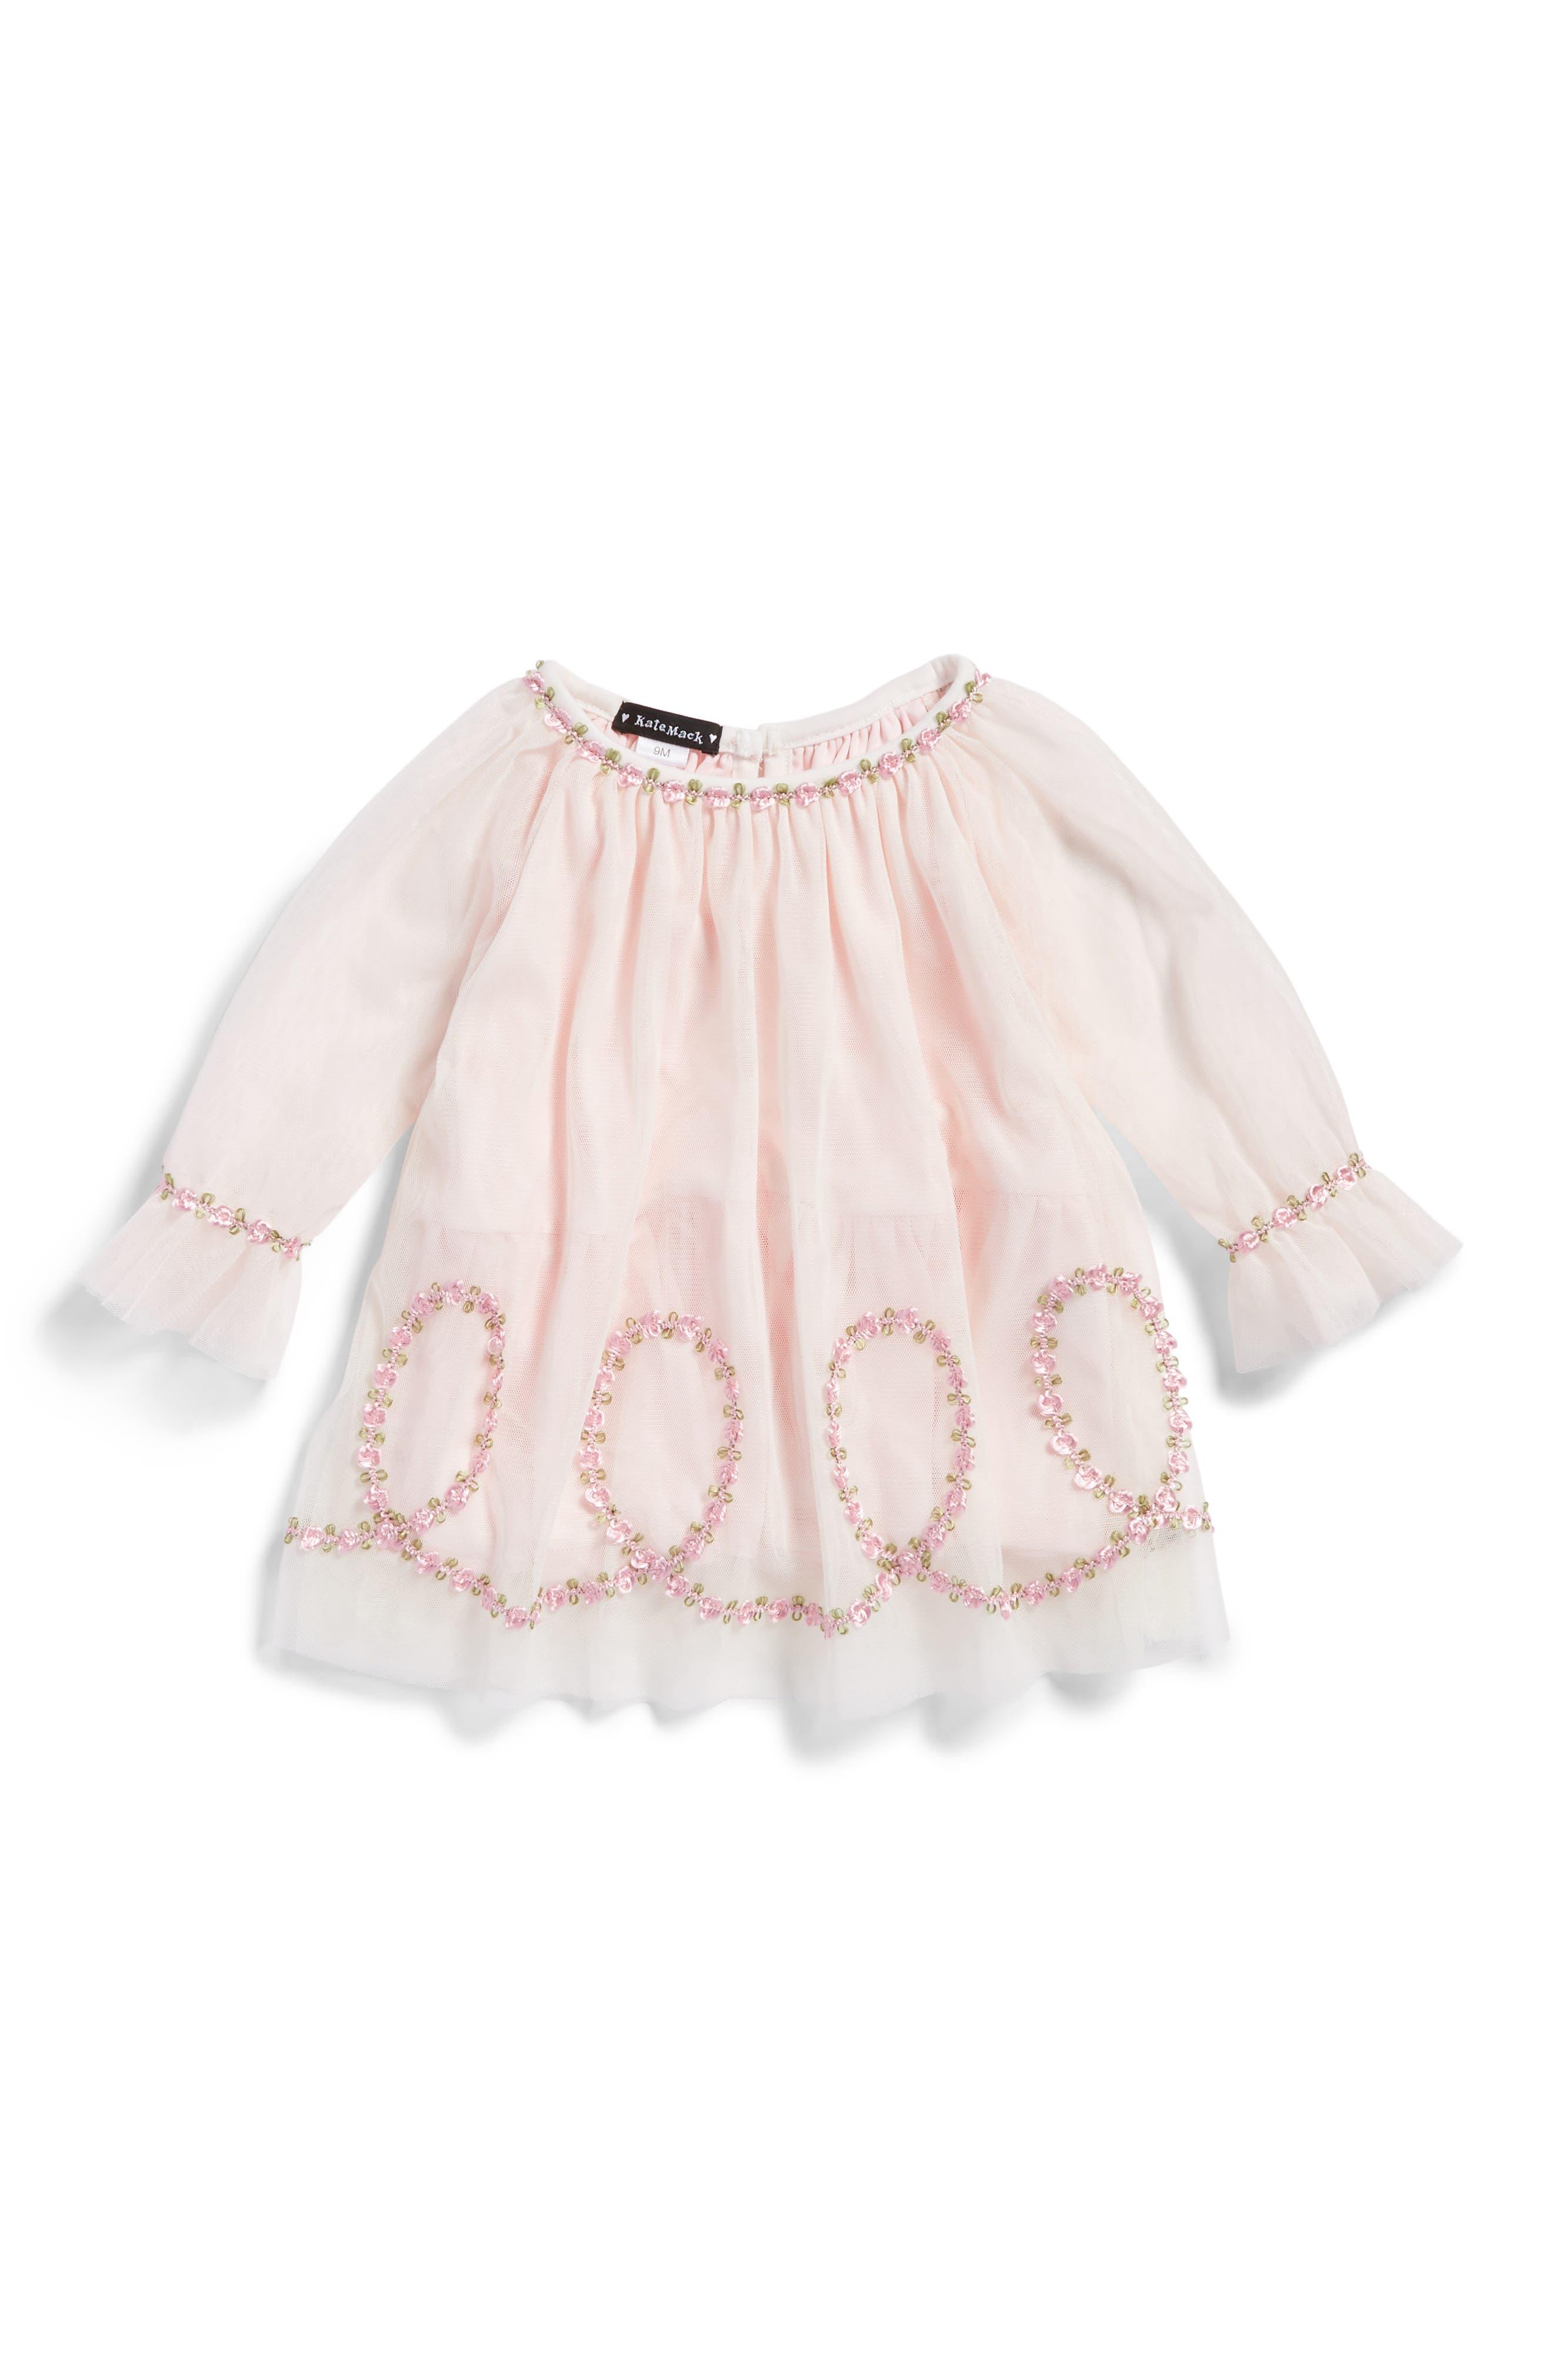 Alternate Image 1 Selected - Kate Mack Embroidered Mesh Dress (Baby Girls)